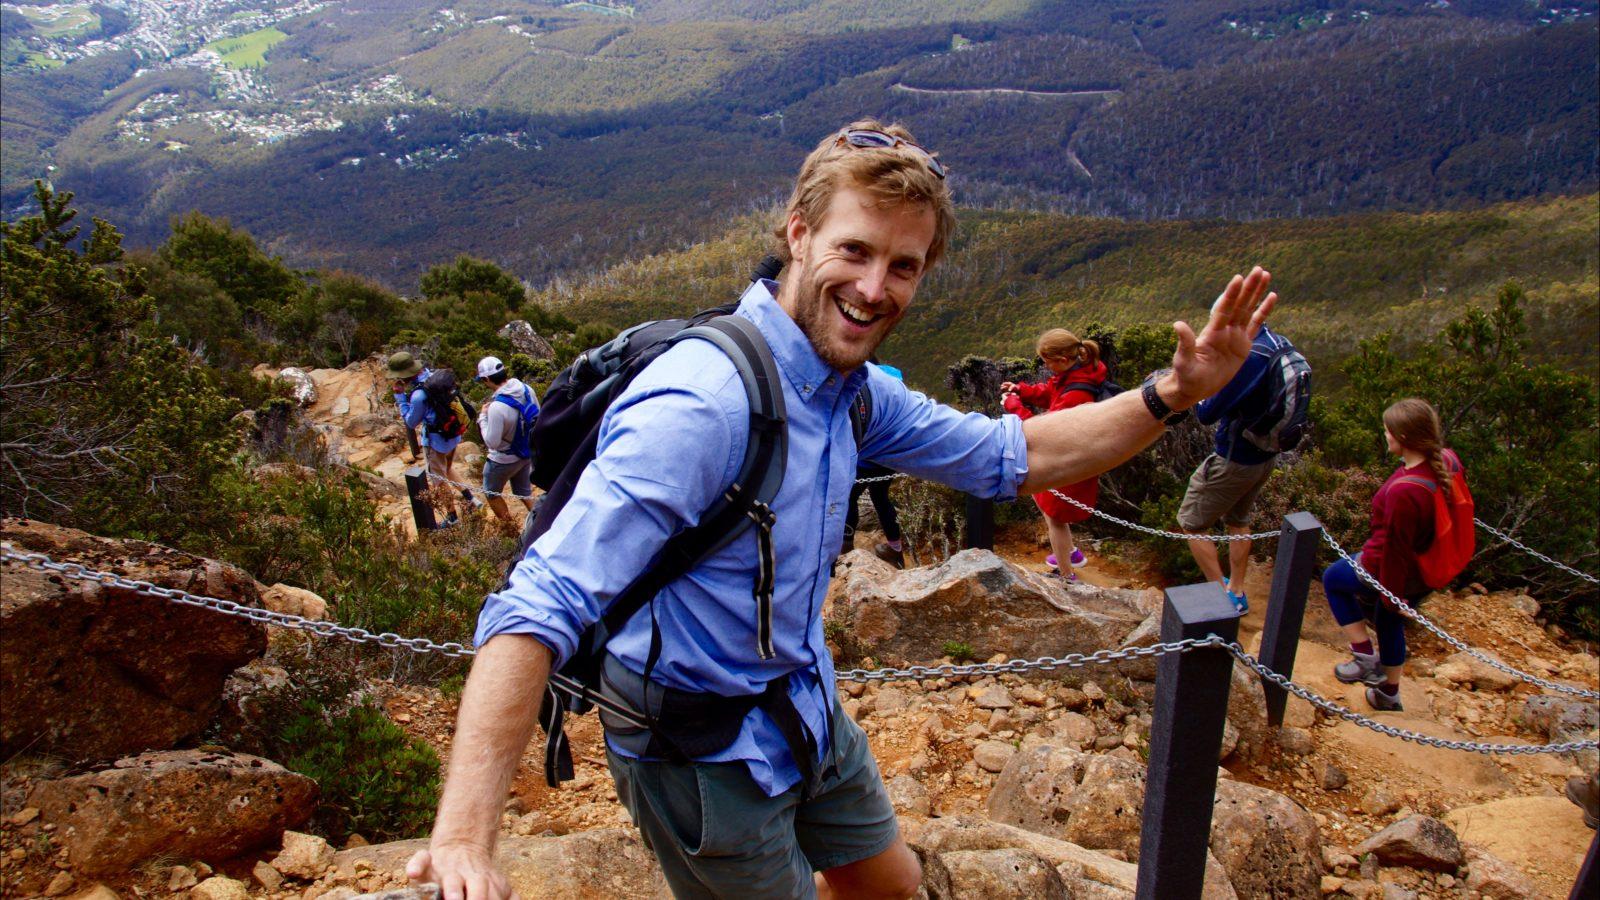 See Tasmania Tours, Pinnacle to Pint, Hobart Hiking Tour, Mt. Wellington tour, kunanyi tours, hobart